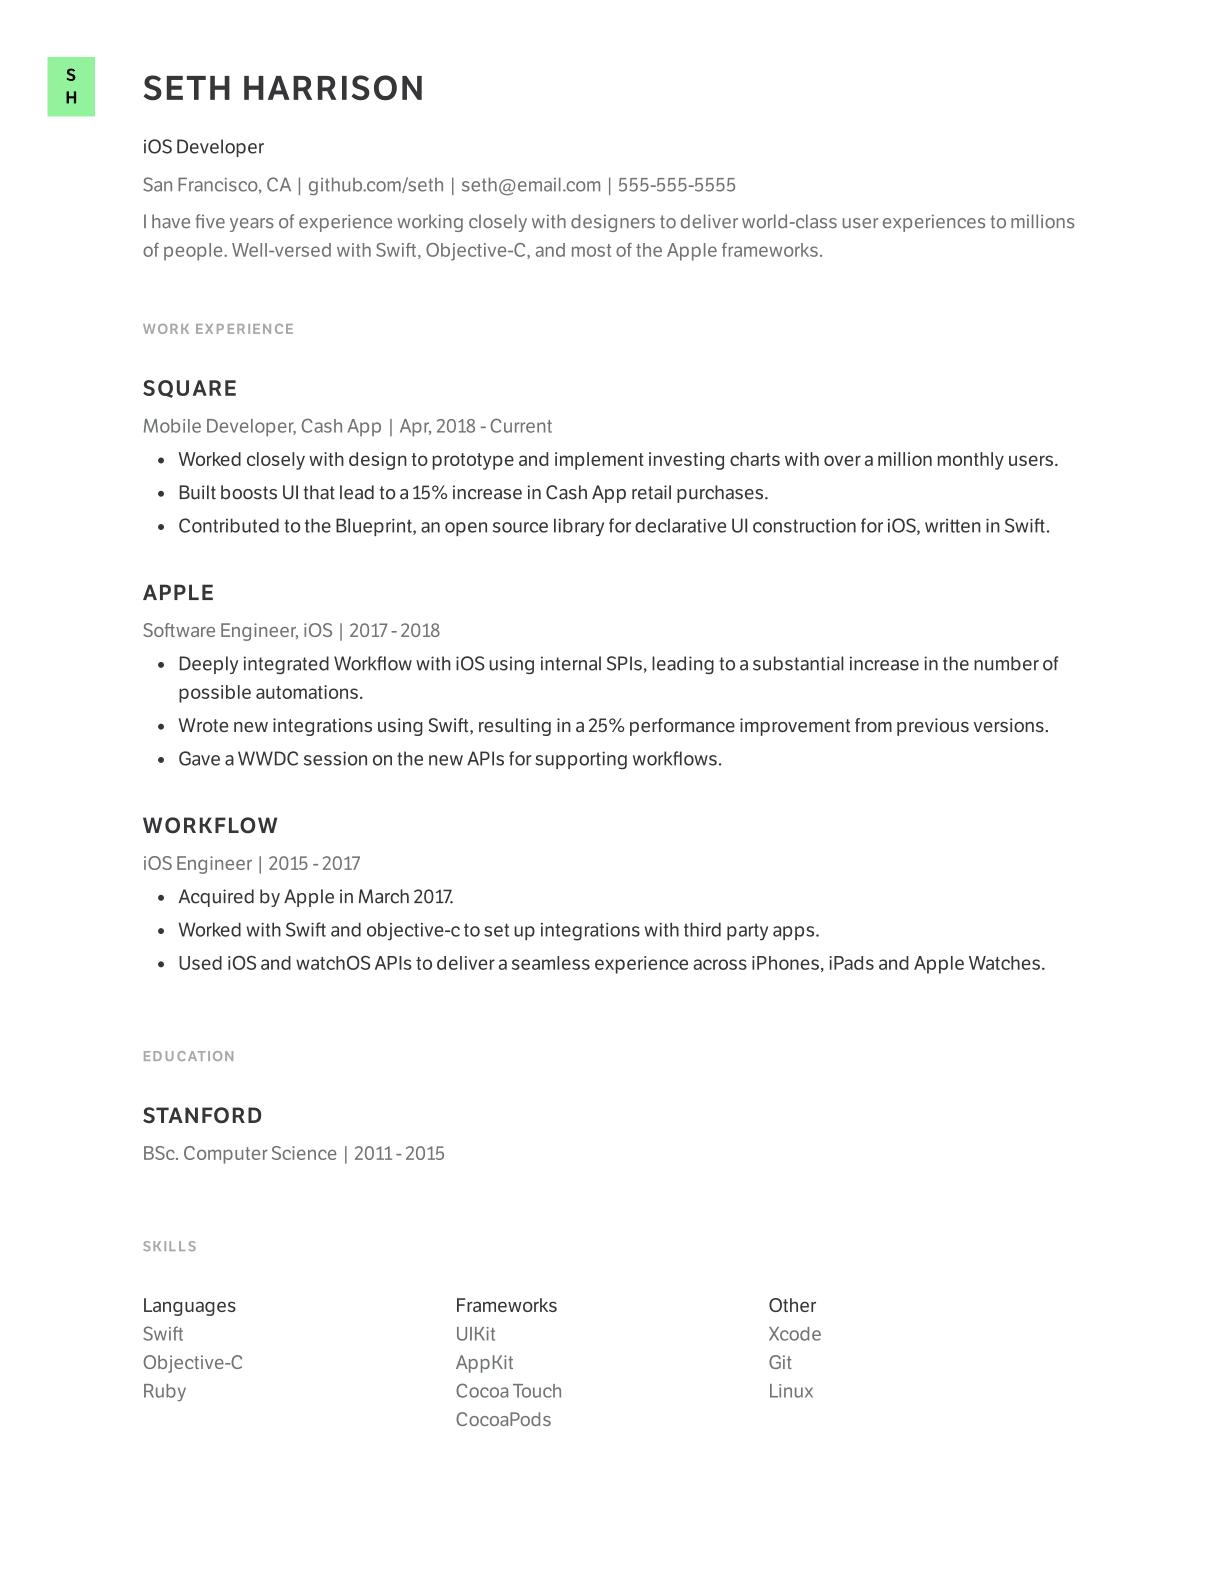 iOS Developer resume template example